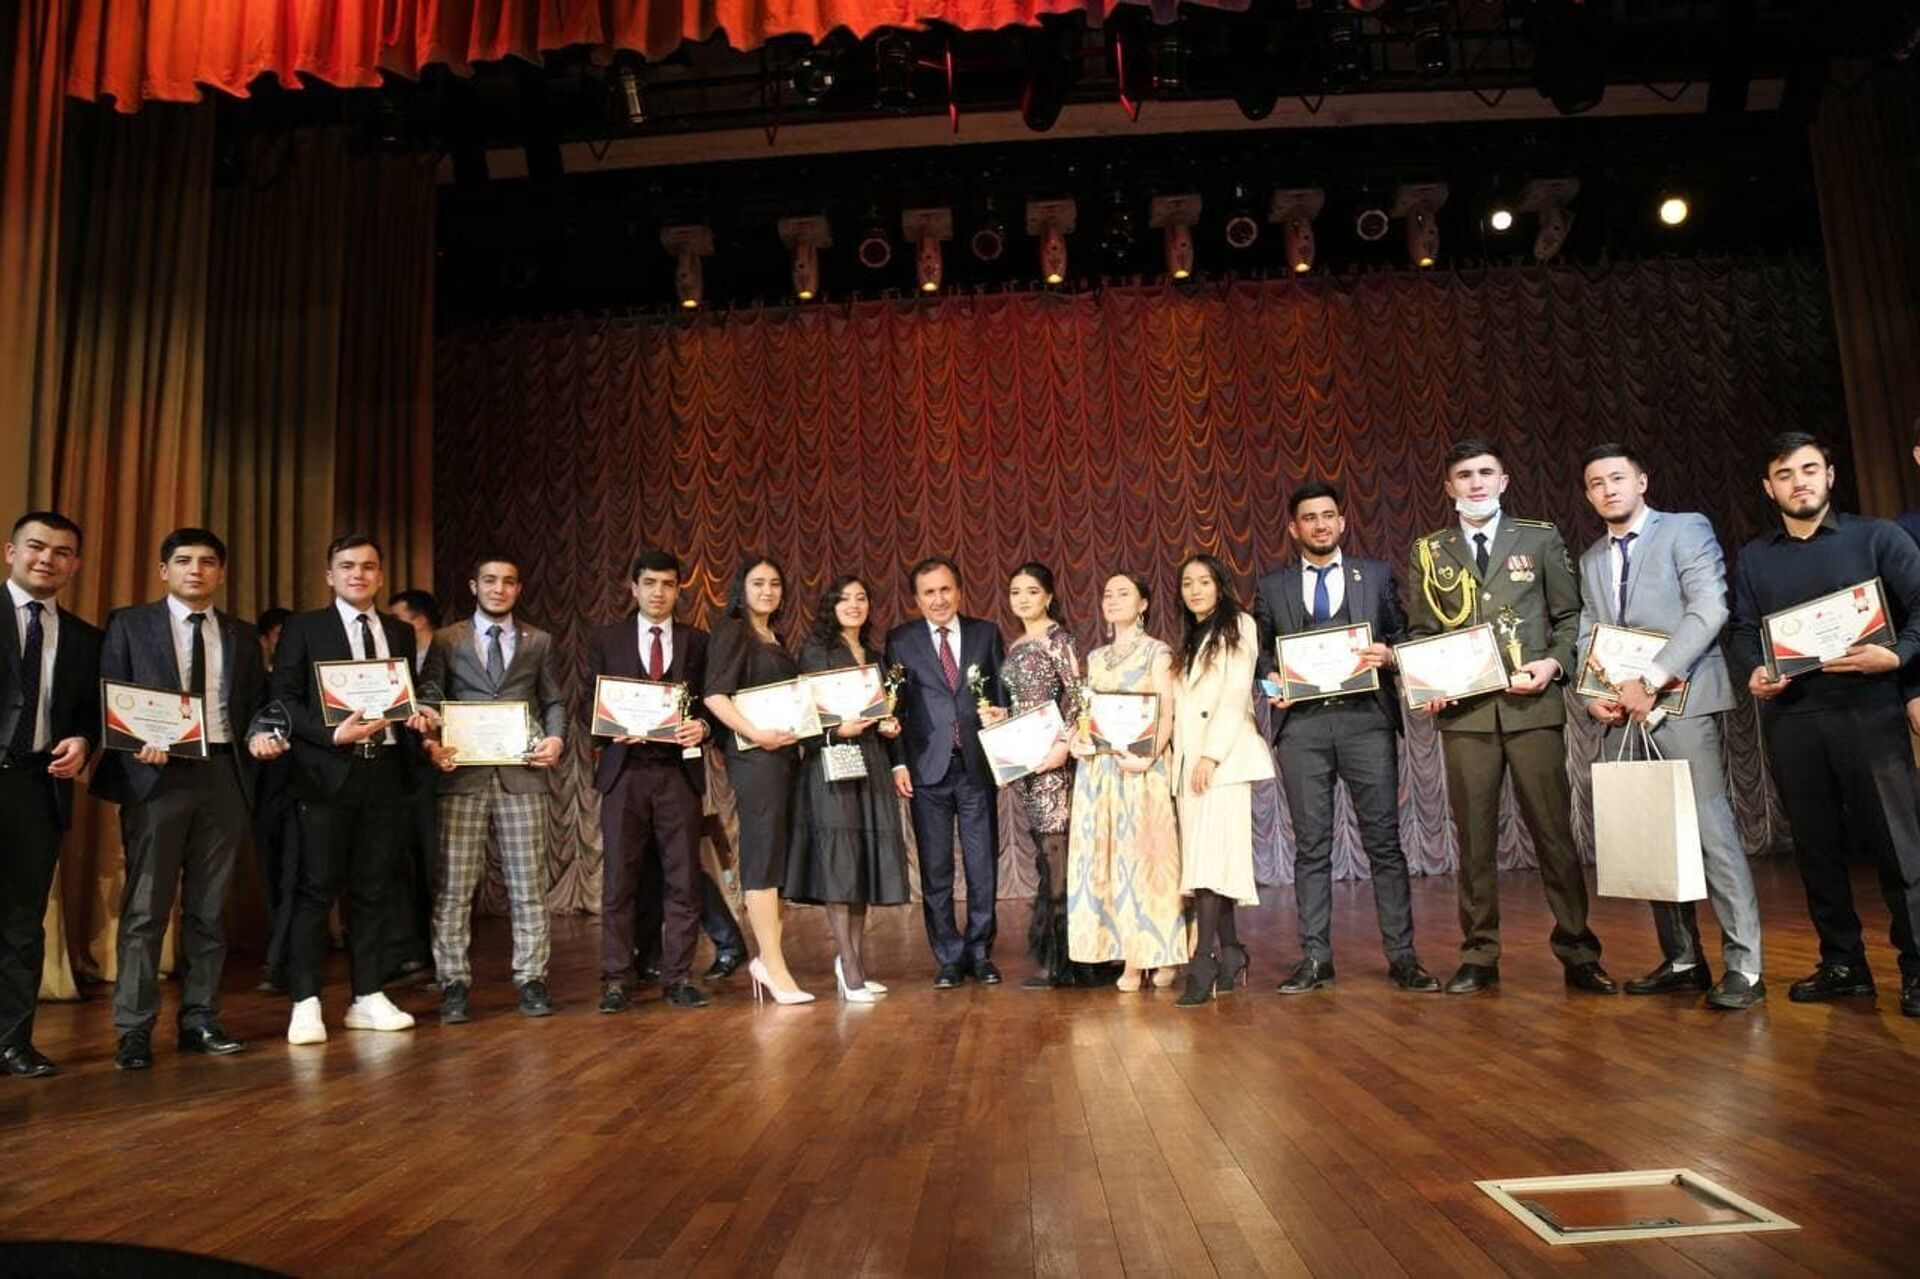 В Москве вручили премии лучшим таджикским студентам - Sputnik Таджикистан, 1920, 06.04.2021